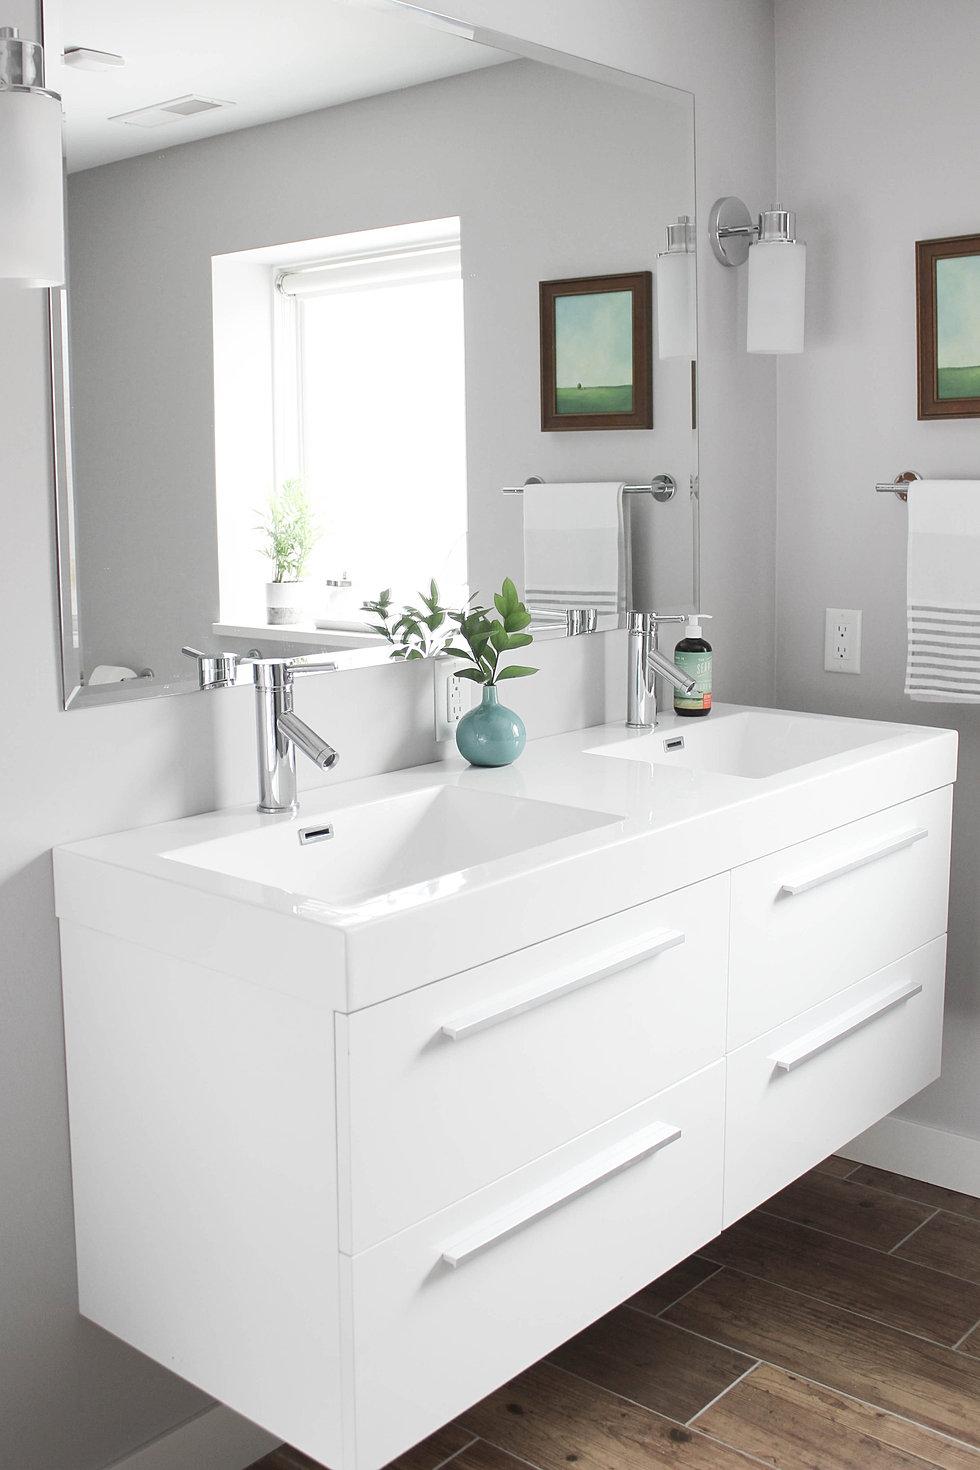 Modern cottage bathroom - Modern Cottage Bathroom Remodel Basement Bathroom Remodel Img_6274